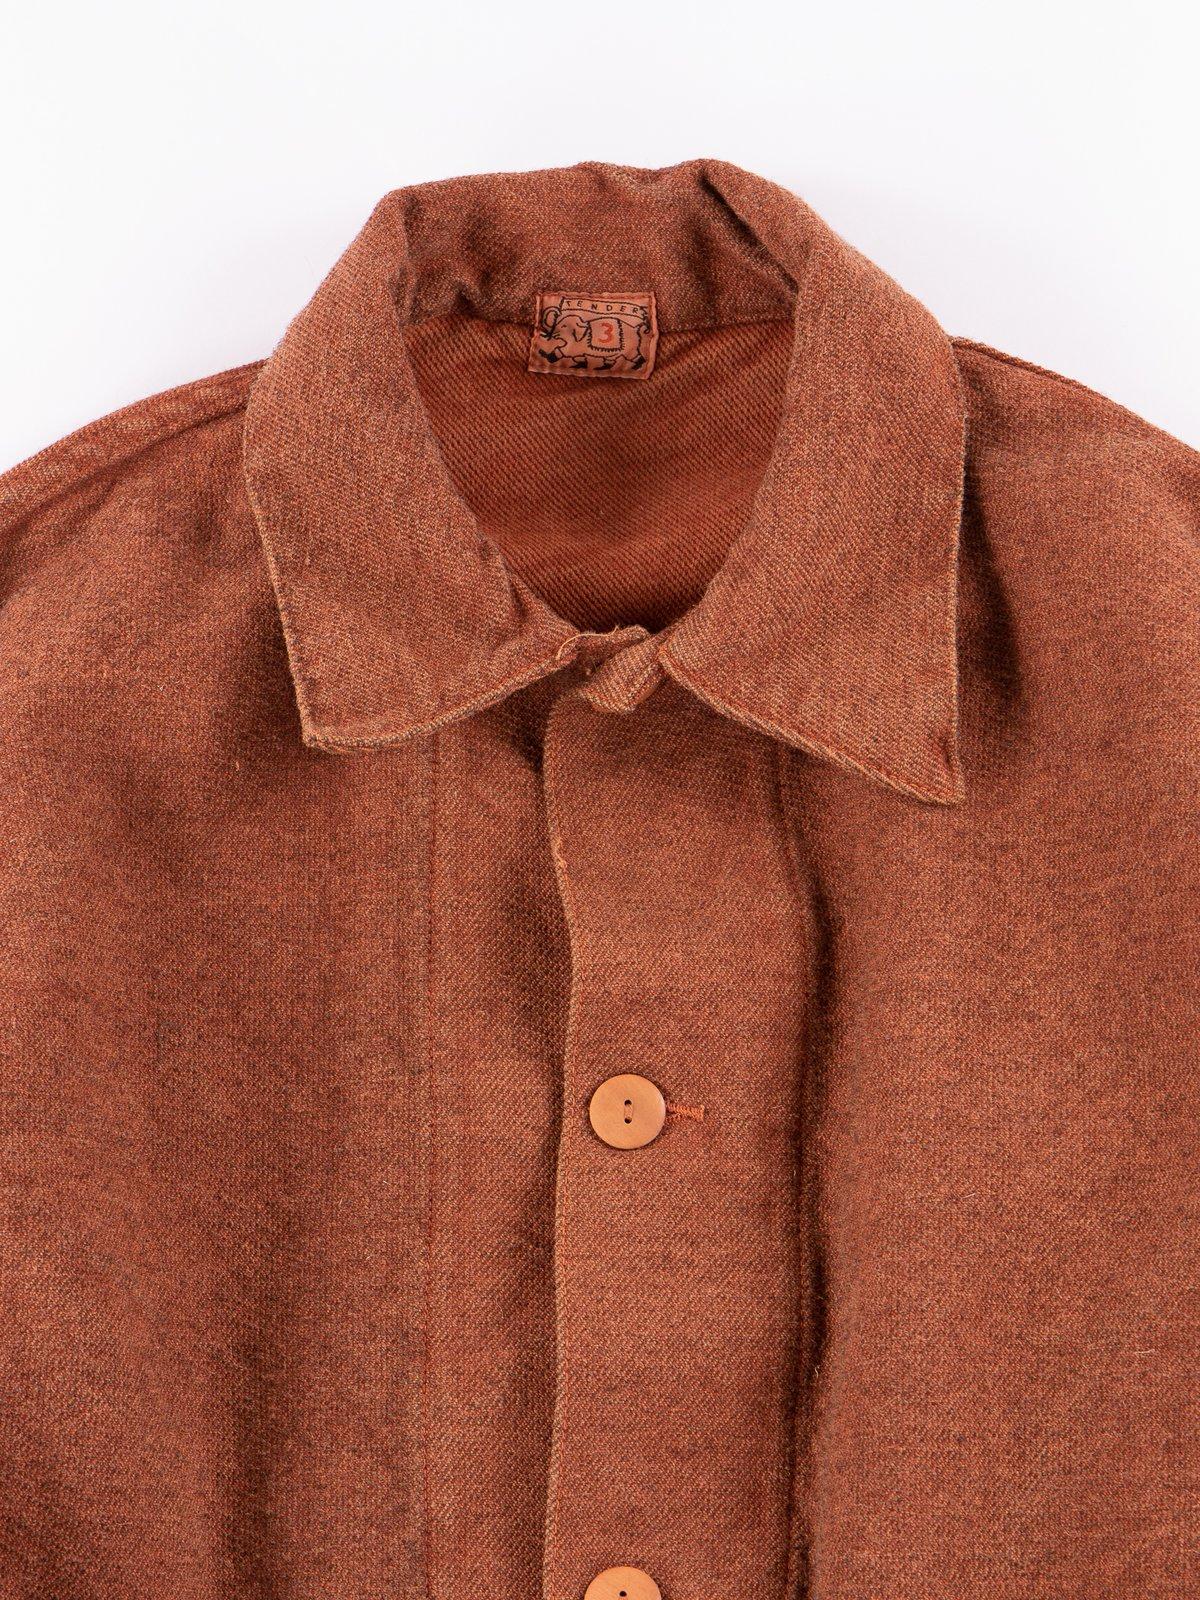 Red Ochre Dye Collared Shepherd's Coat - Image 3